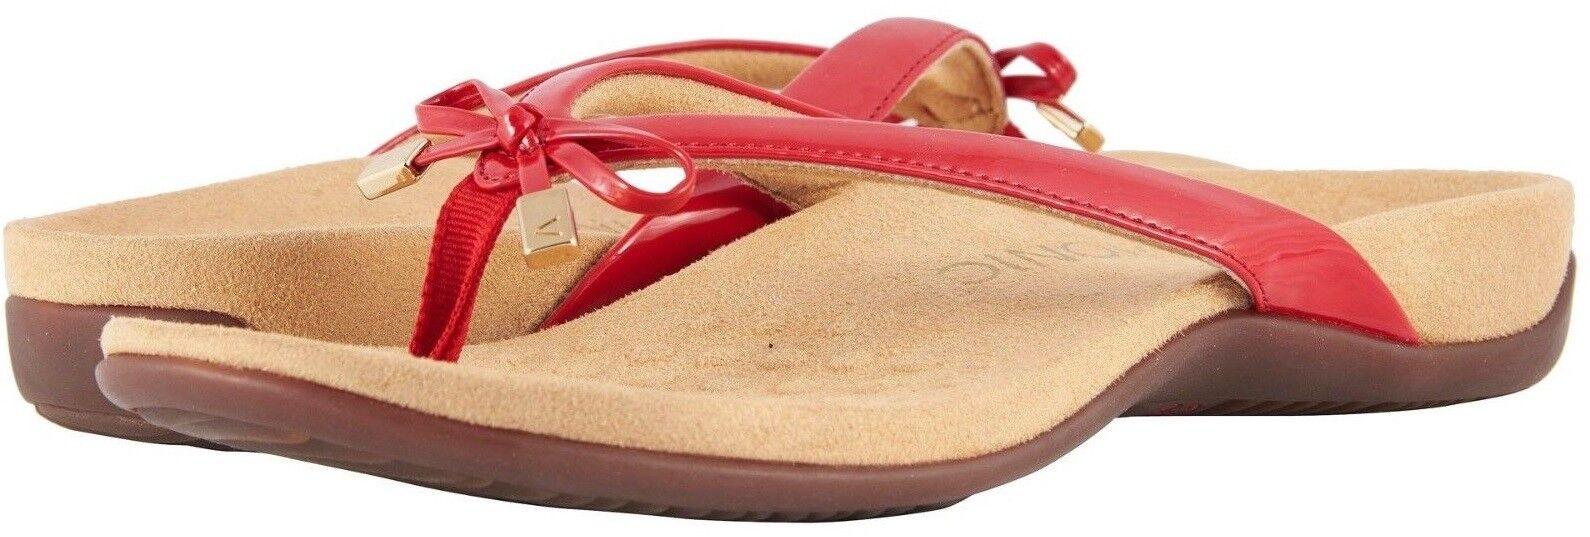 Women's Birki's Birkenstock Clogs Brown Leather Mule Shoes Slip Sz.38/7 Slip Shoes Ons 783164